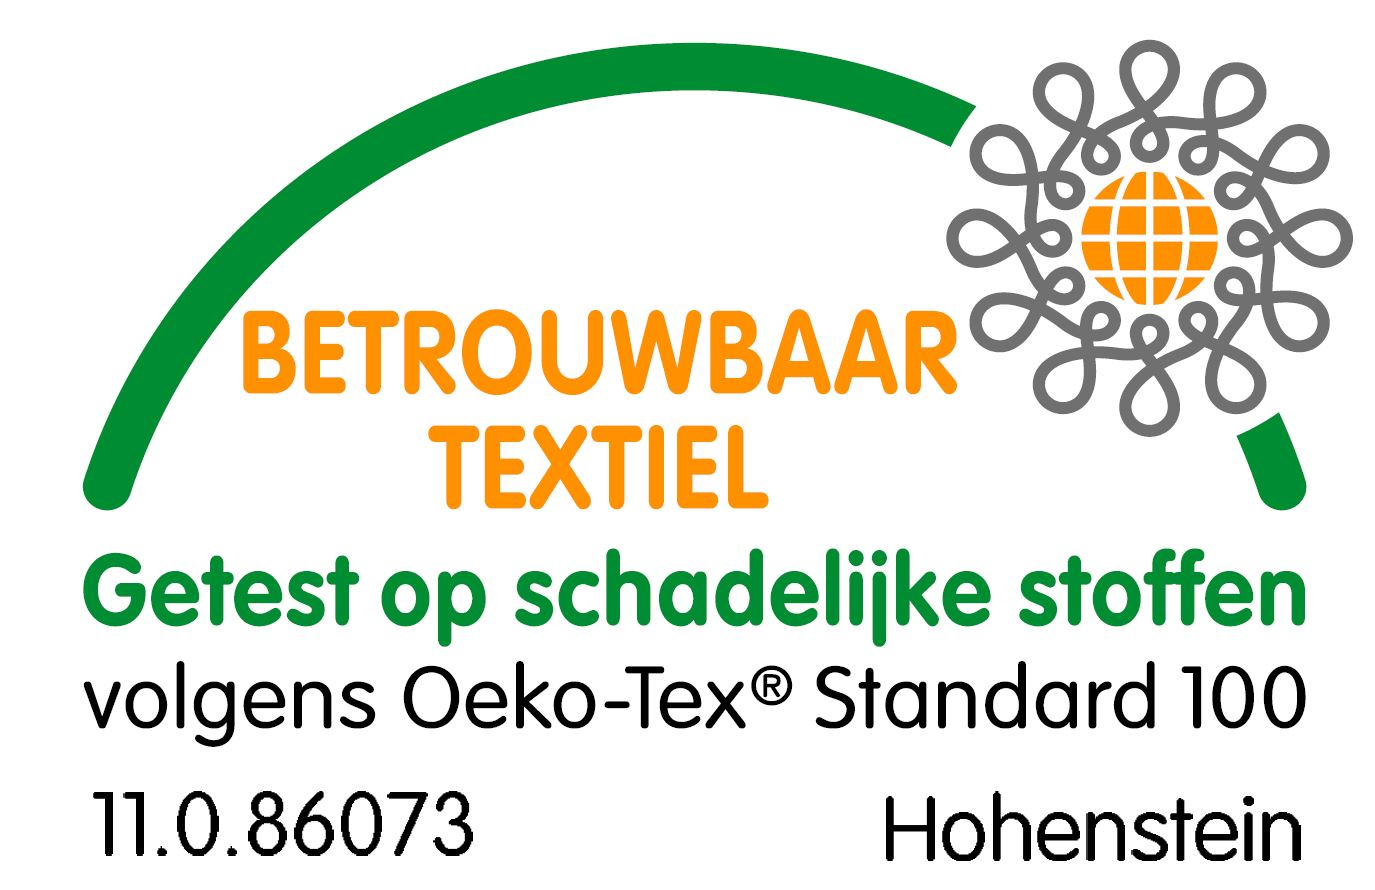 Oeko-Tex Prüfung